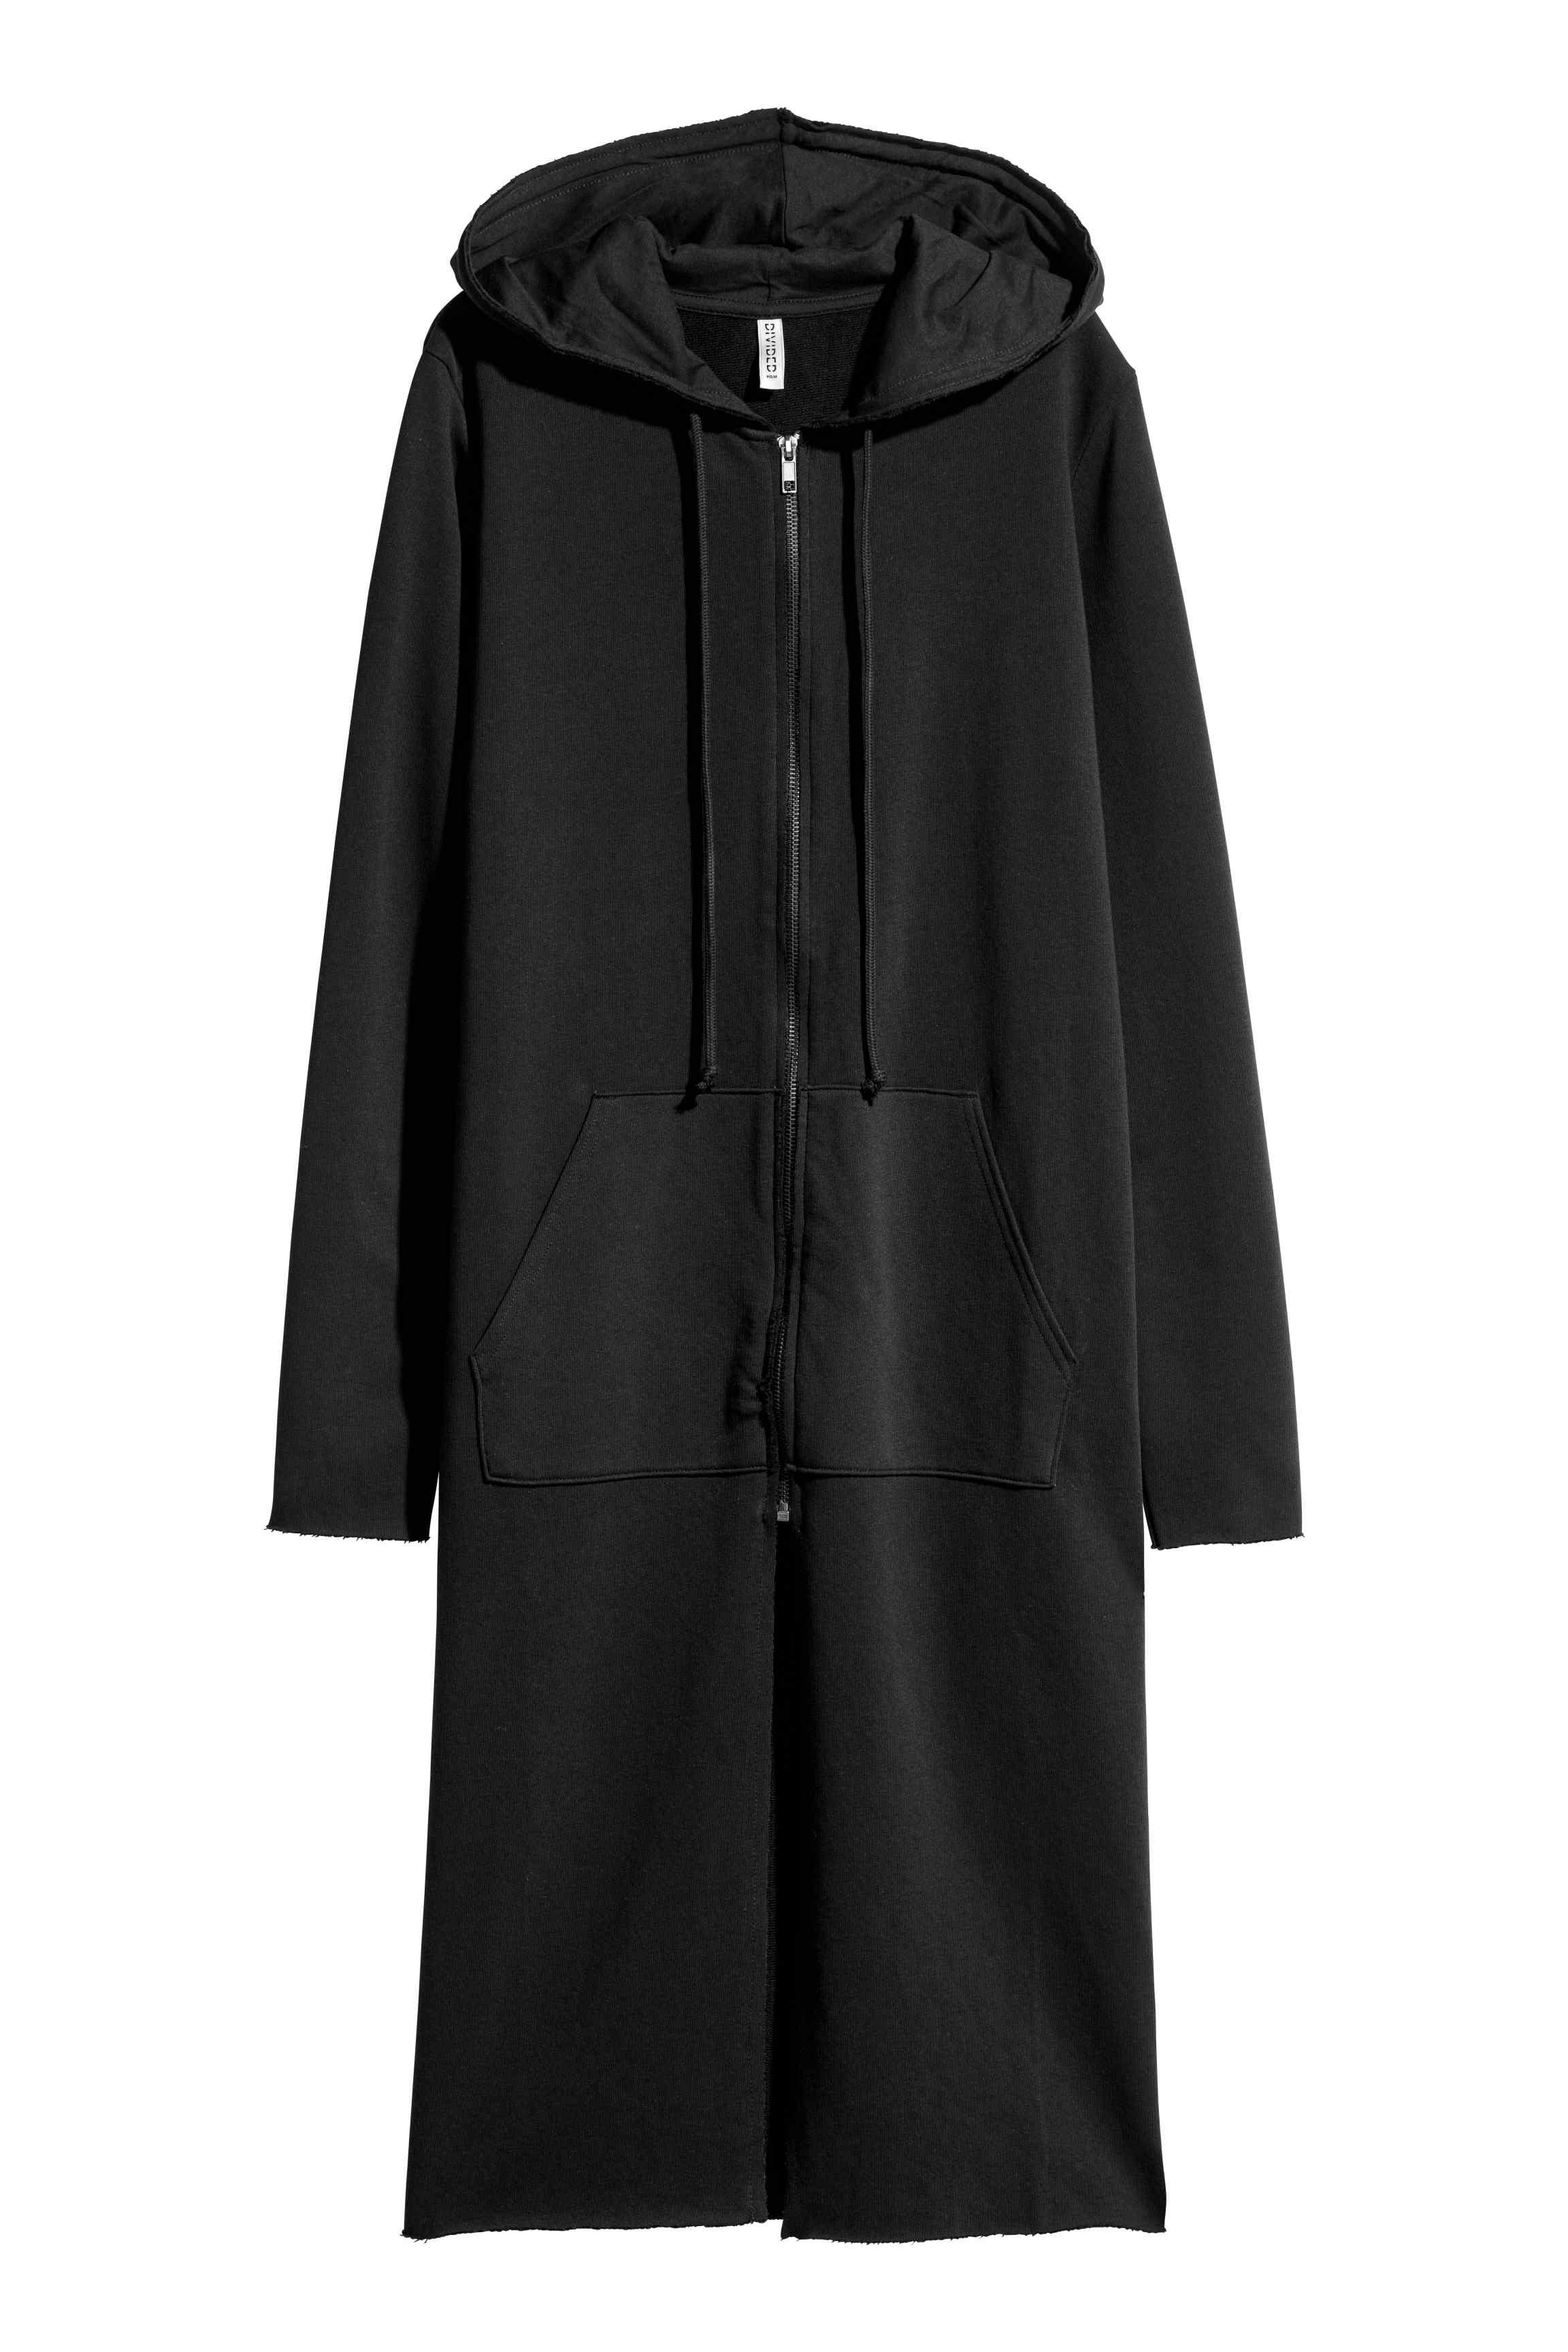 H&m Long Sweatshirt Cardigan in Black | Lyst